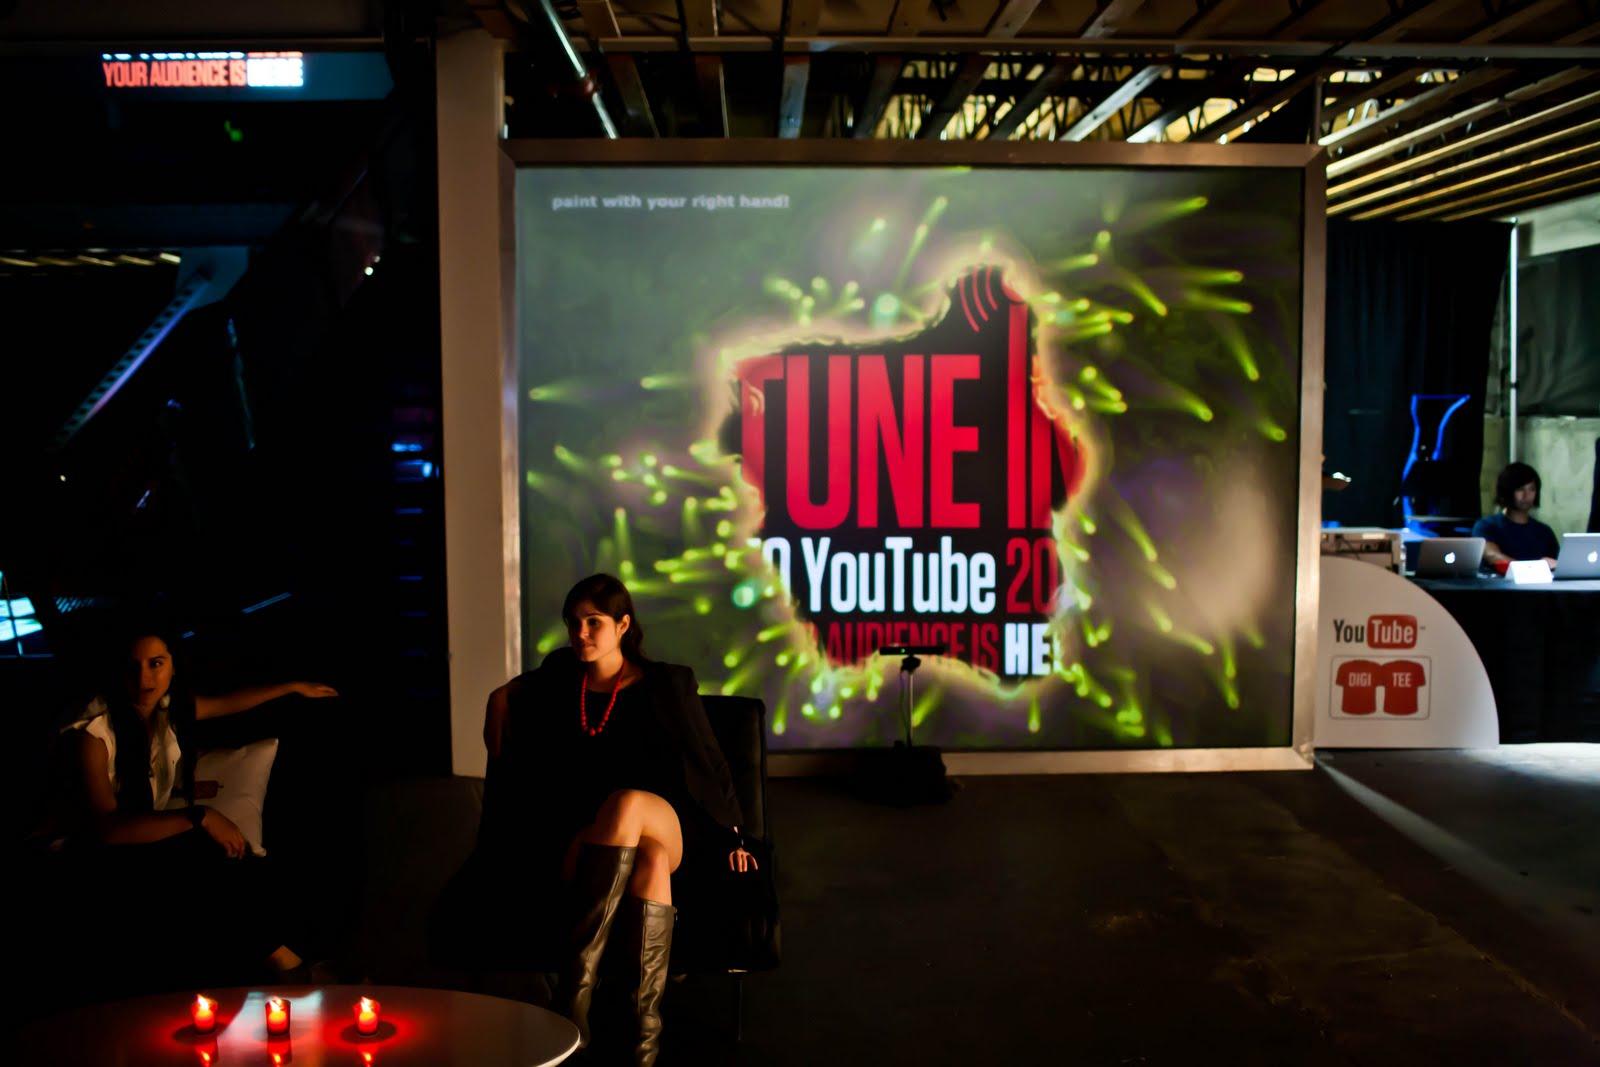 Tune In YouTube - 55.jpg